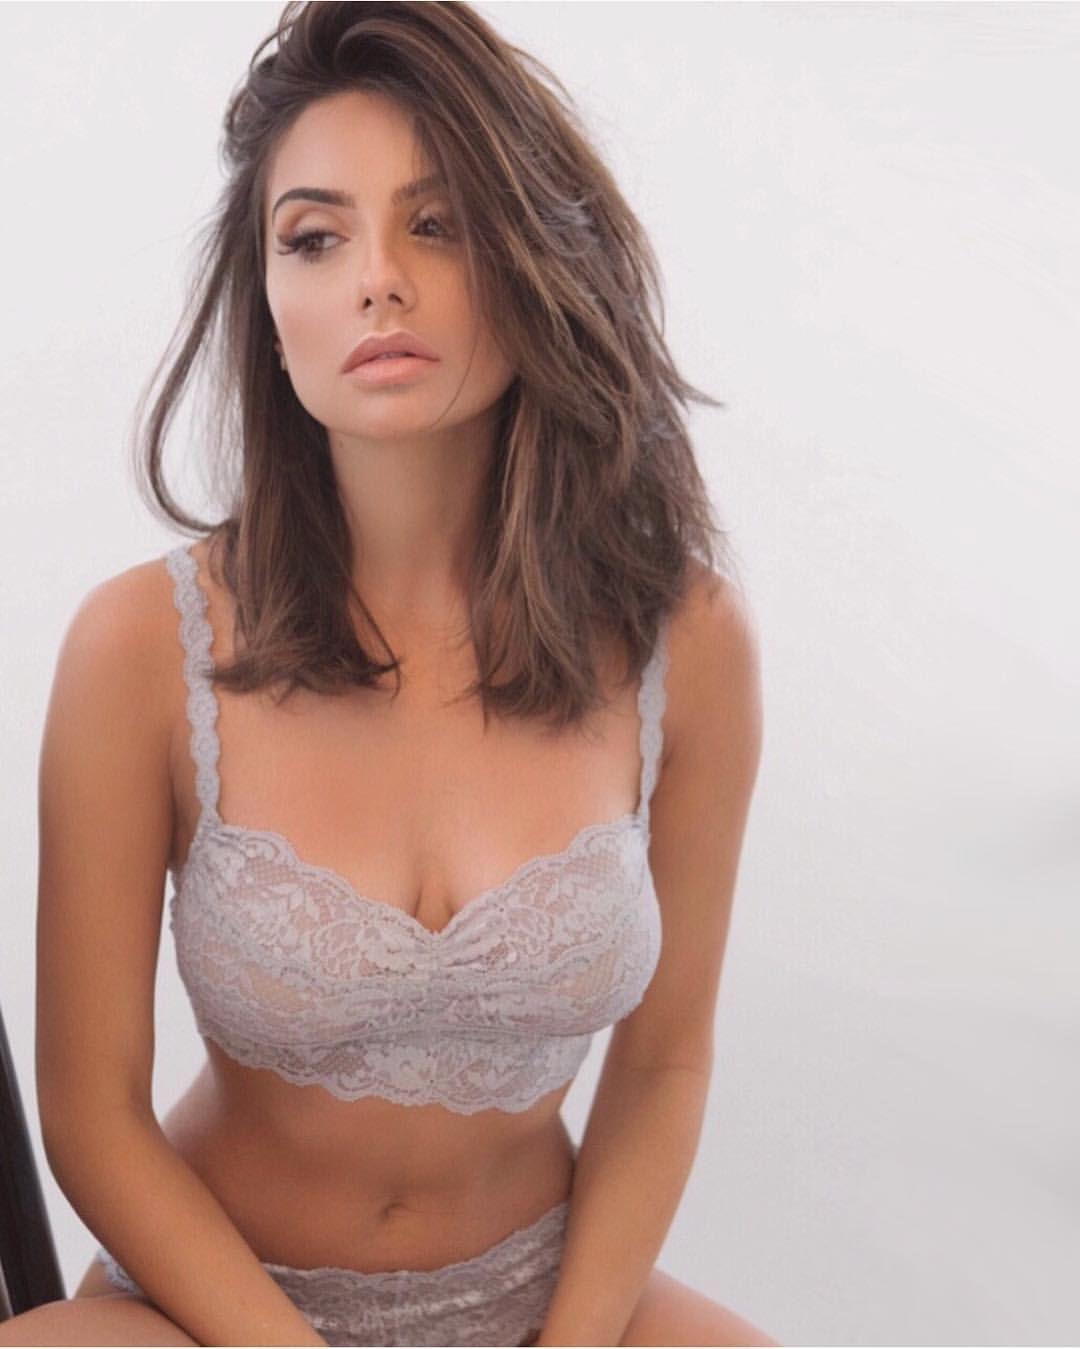 mikaela hoover tits